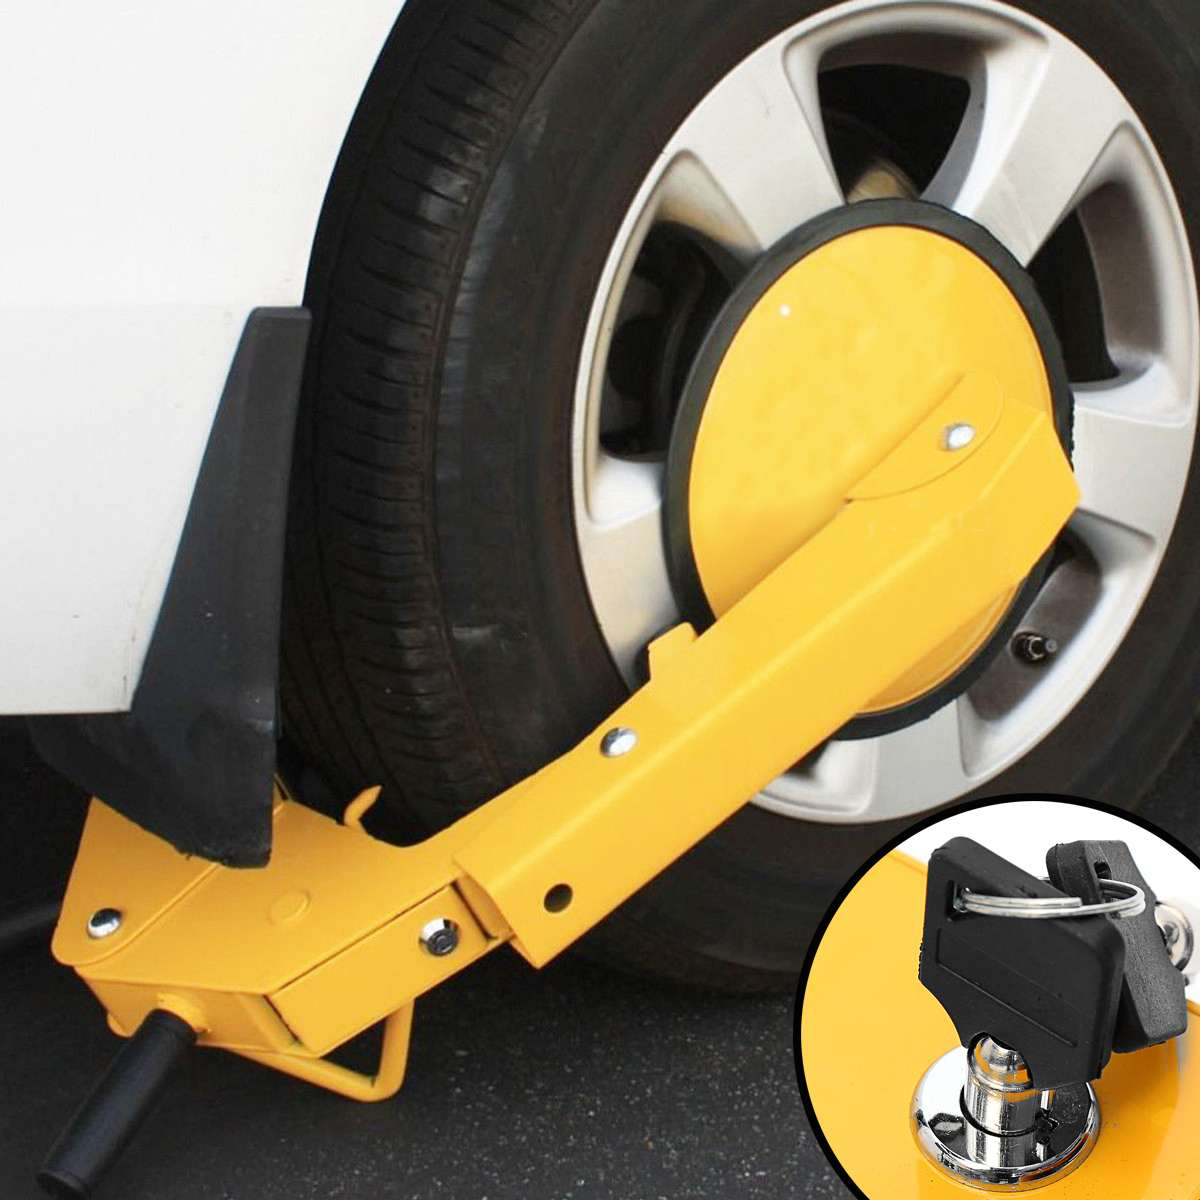 Car Tire Claw ATV RV Wheel Clamp Boat Truck Trailer Lock Anti Theft Parking